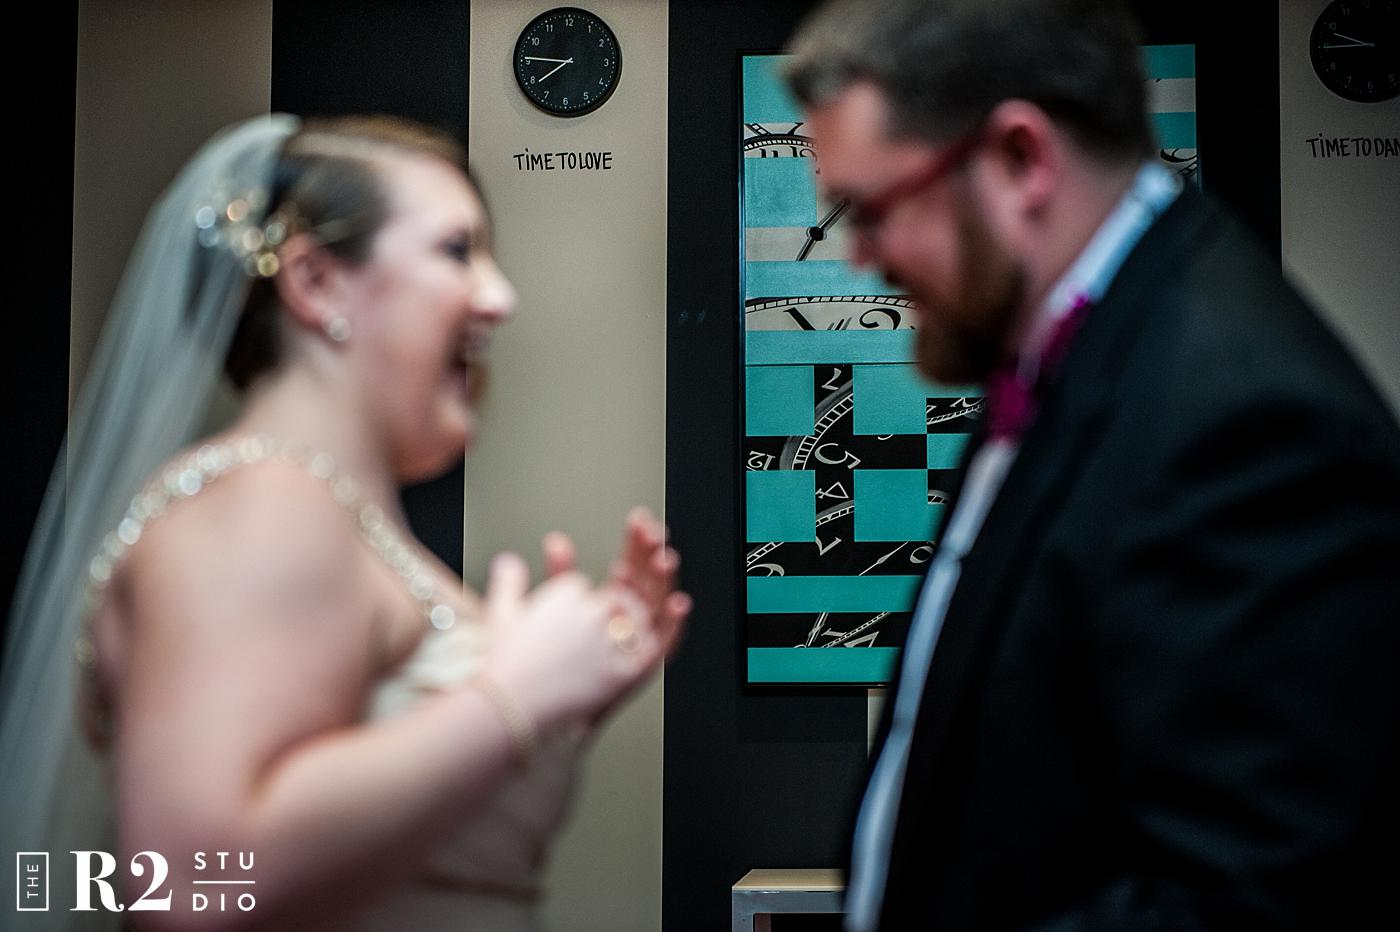 #desirableeventsbydesi, #weddingplannerlasvegas,#lasvegasweddingcoordinators,#weddingcoordinatorslasvegas,#weddingcoordinatorlasvegas,#lasvegasweddingplanner #desirableeventsbydesi #Tropicanawedding #wedding, #love, #lovewins, #samesexwedding, #gaywedding, #tropicana, #lasvegaswedding, #weddinglasvegas, #weddingplannerslasvegas, #lasvegasweddingplanners, # layersoflovely, #lasvegaswedding, #susieandwill, #rusticwedding, #wedding, #historic5thstreetschool, #downtownlasvegas, #sls, #sayersclub, #bazaarmeats, #slslv, #slslasvegas #slsweddings, #lasvegasweddings,